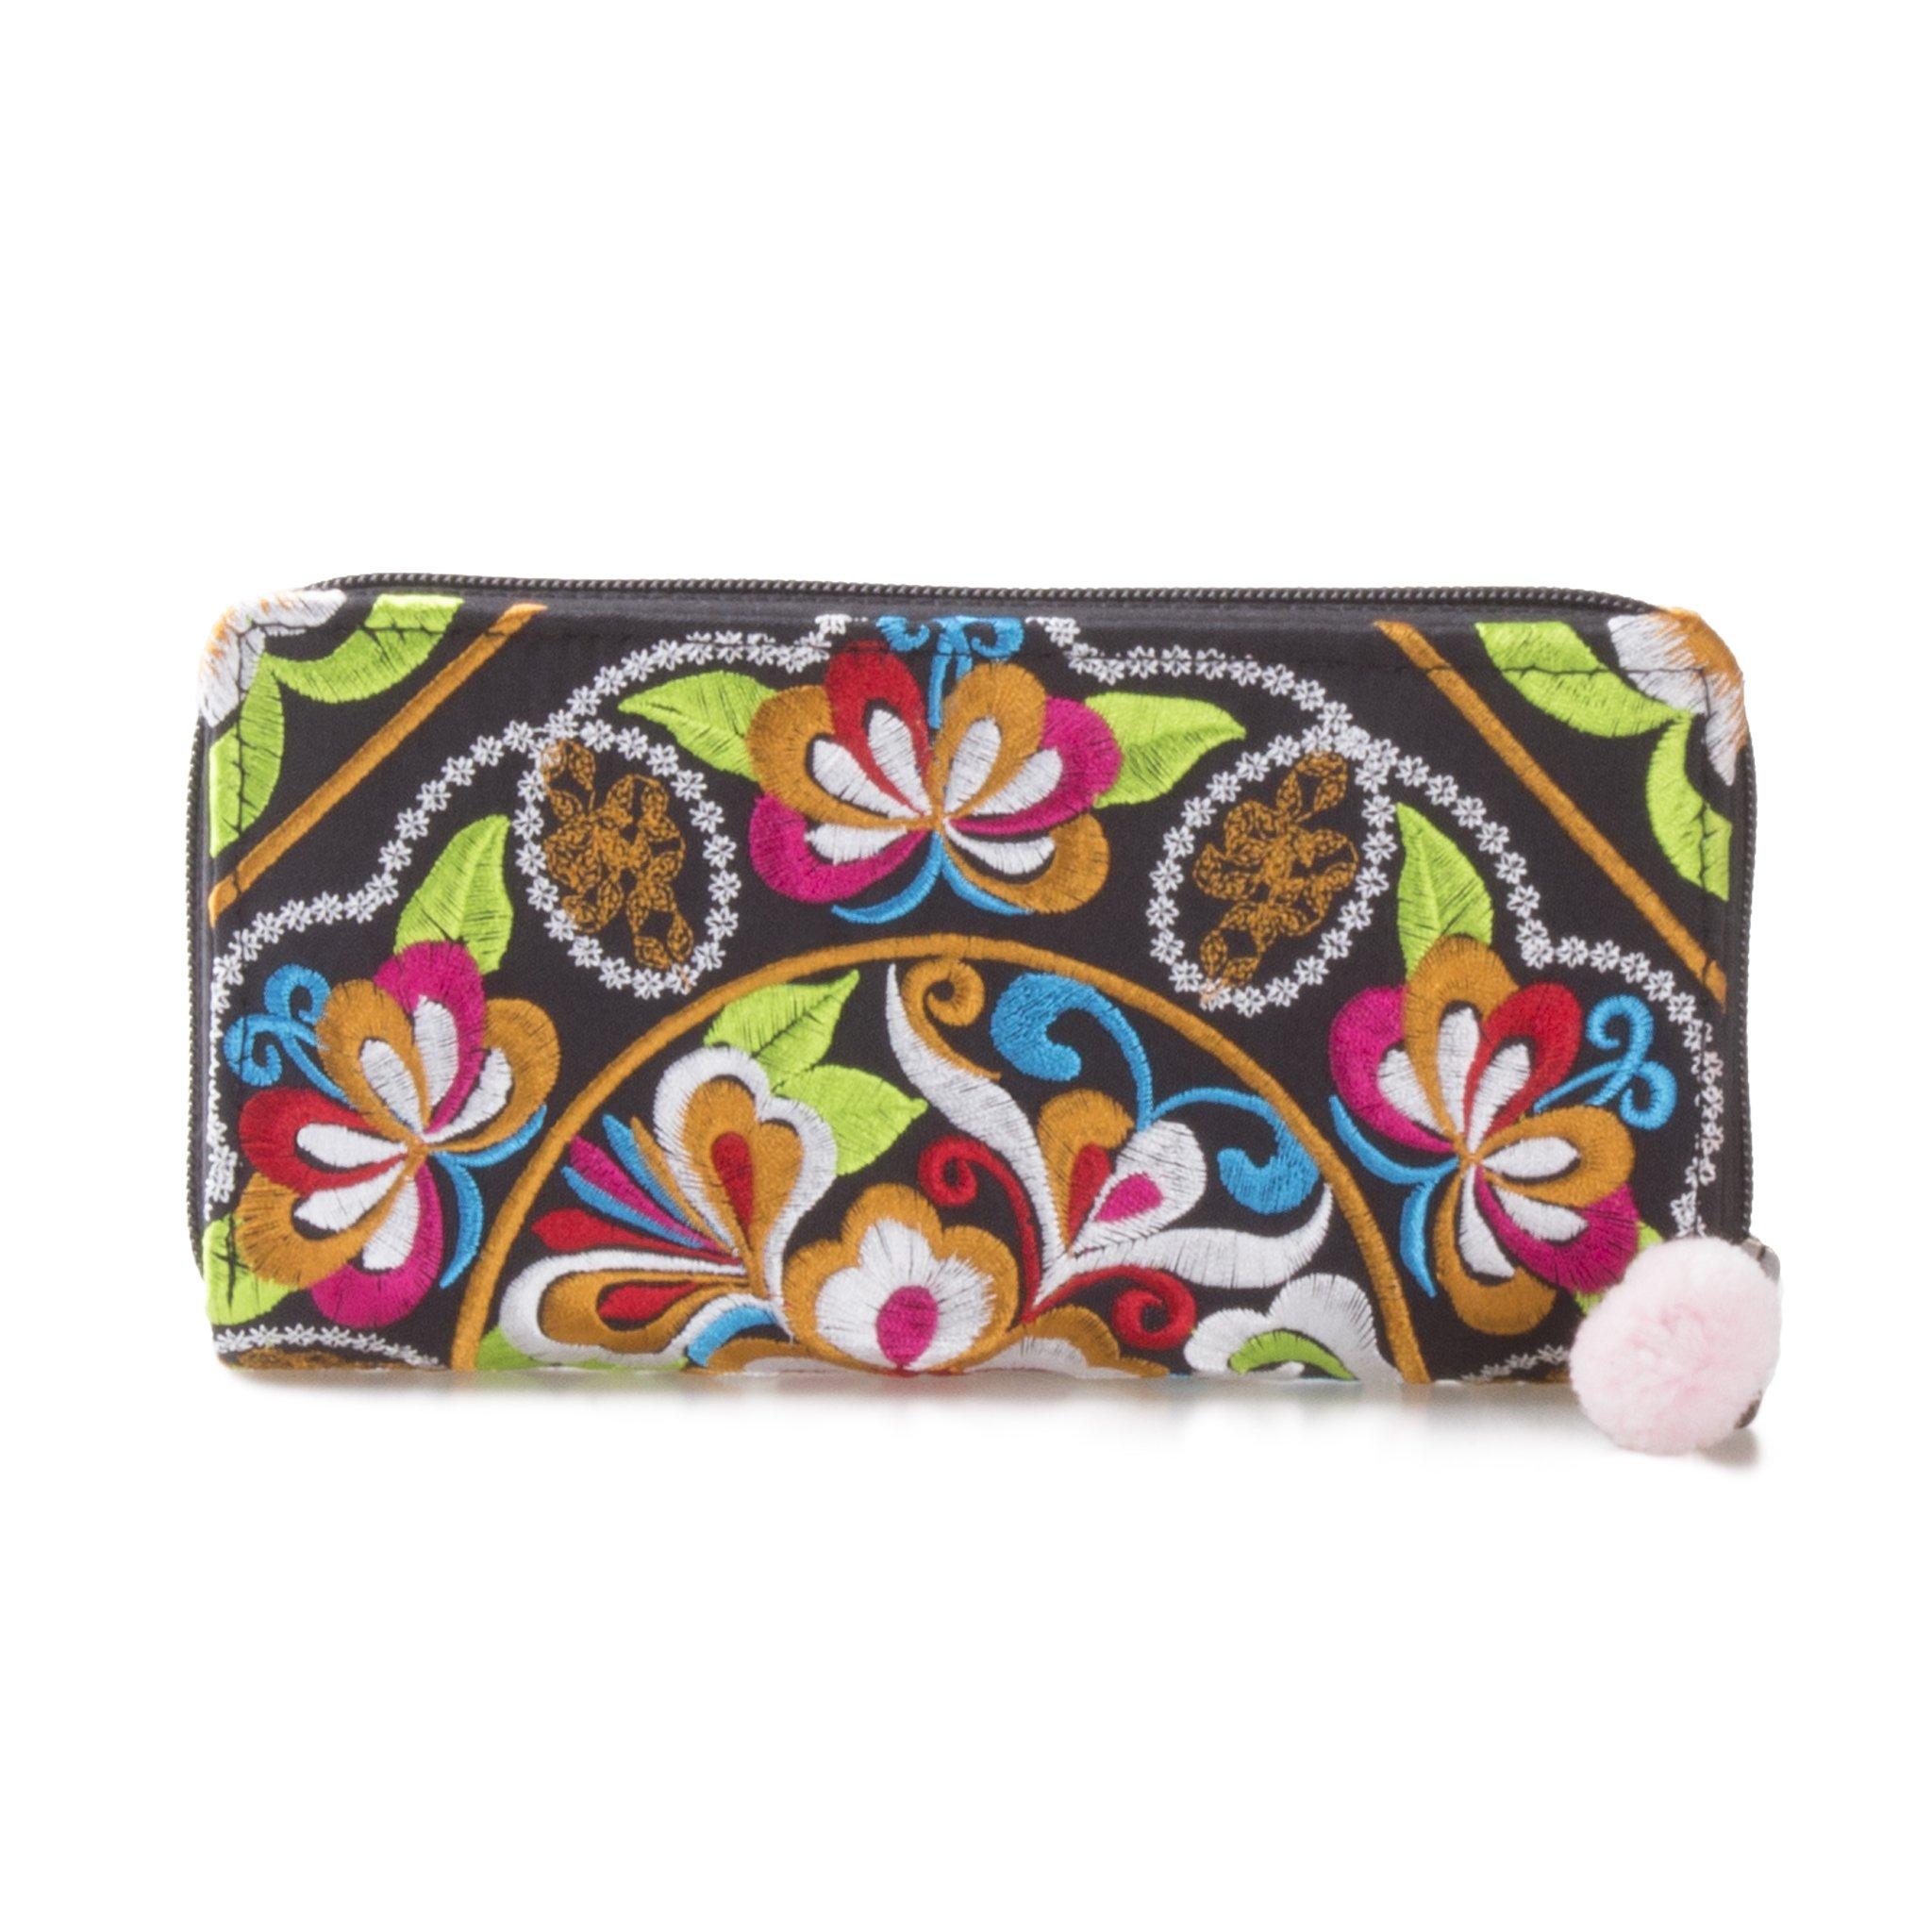 Changnoi Unique Handmade Women's Wallet Thai Hmong Embroidered Fabric (Garden Black)